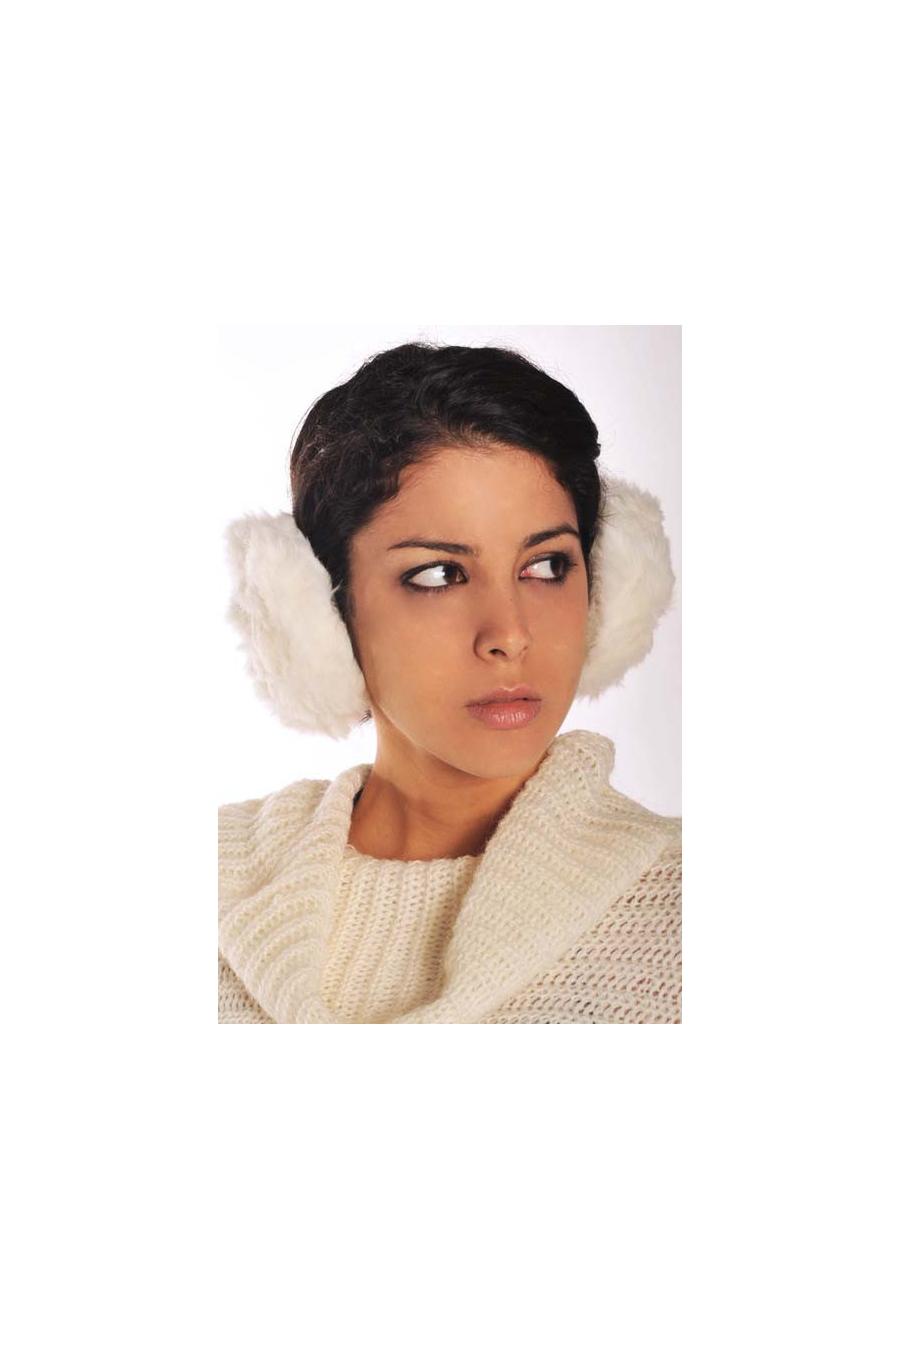 Super fashion fur earmuff, to wear very classy. Clothing wholesaler